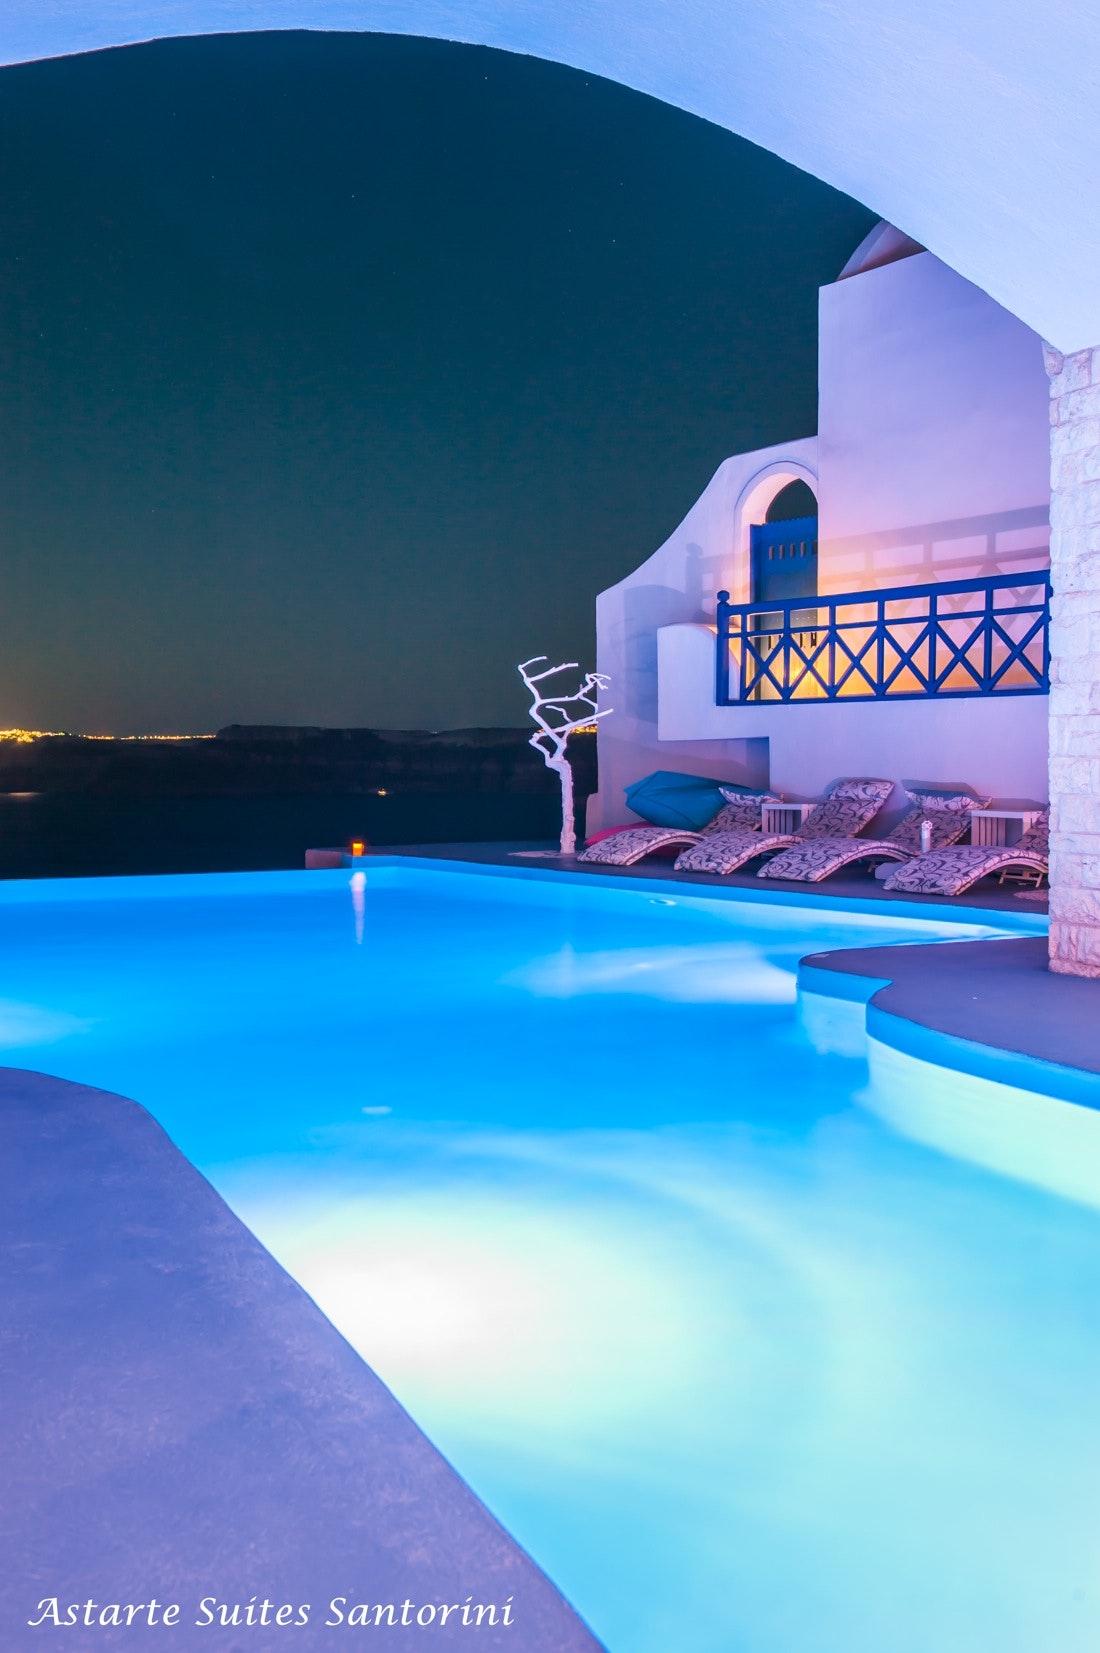 Astarte Suites Hotel Santorini Greece A Amp J Archinect